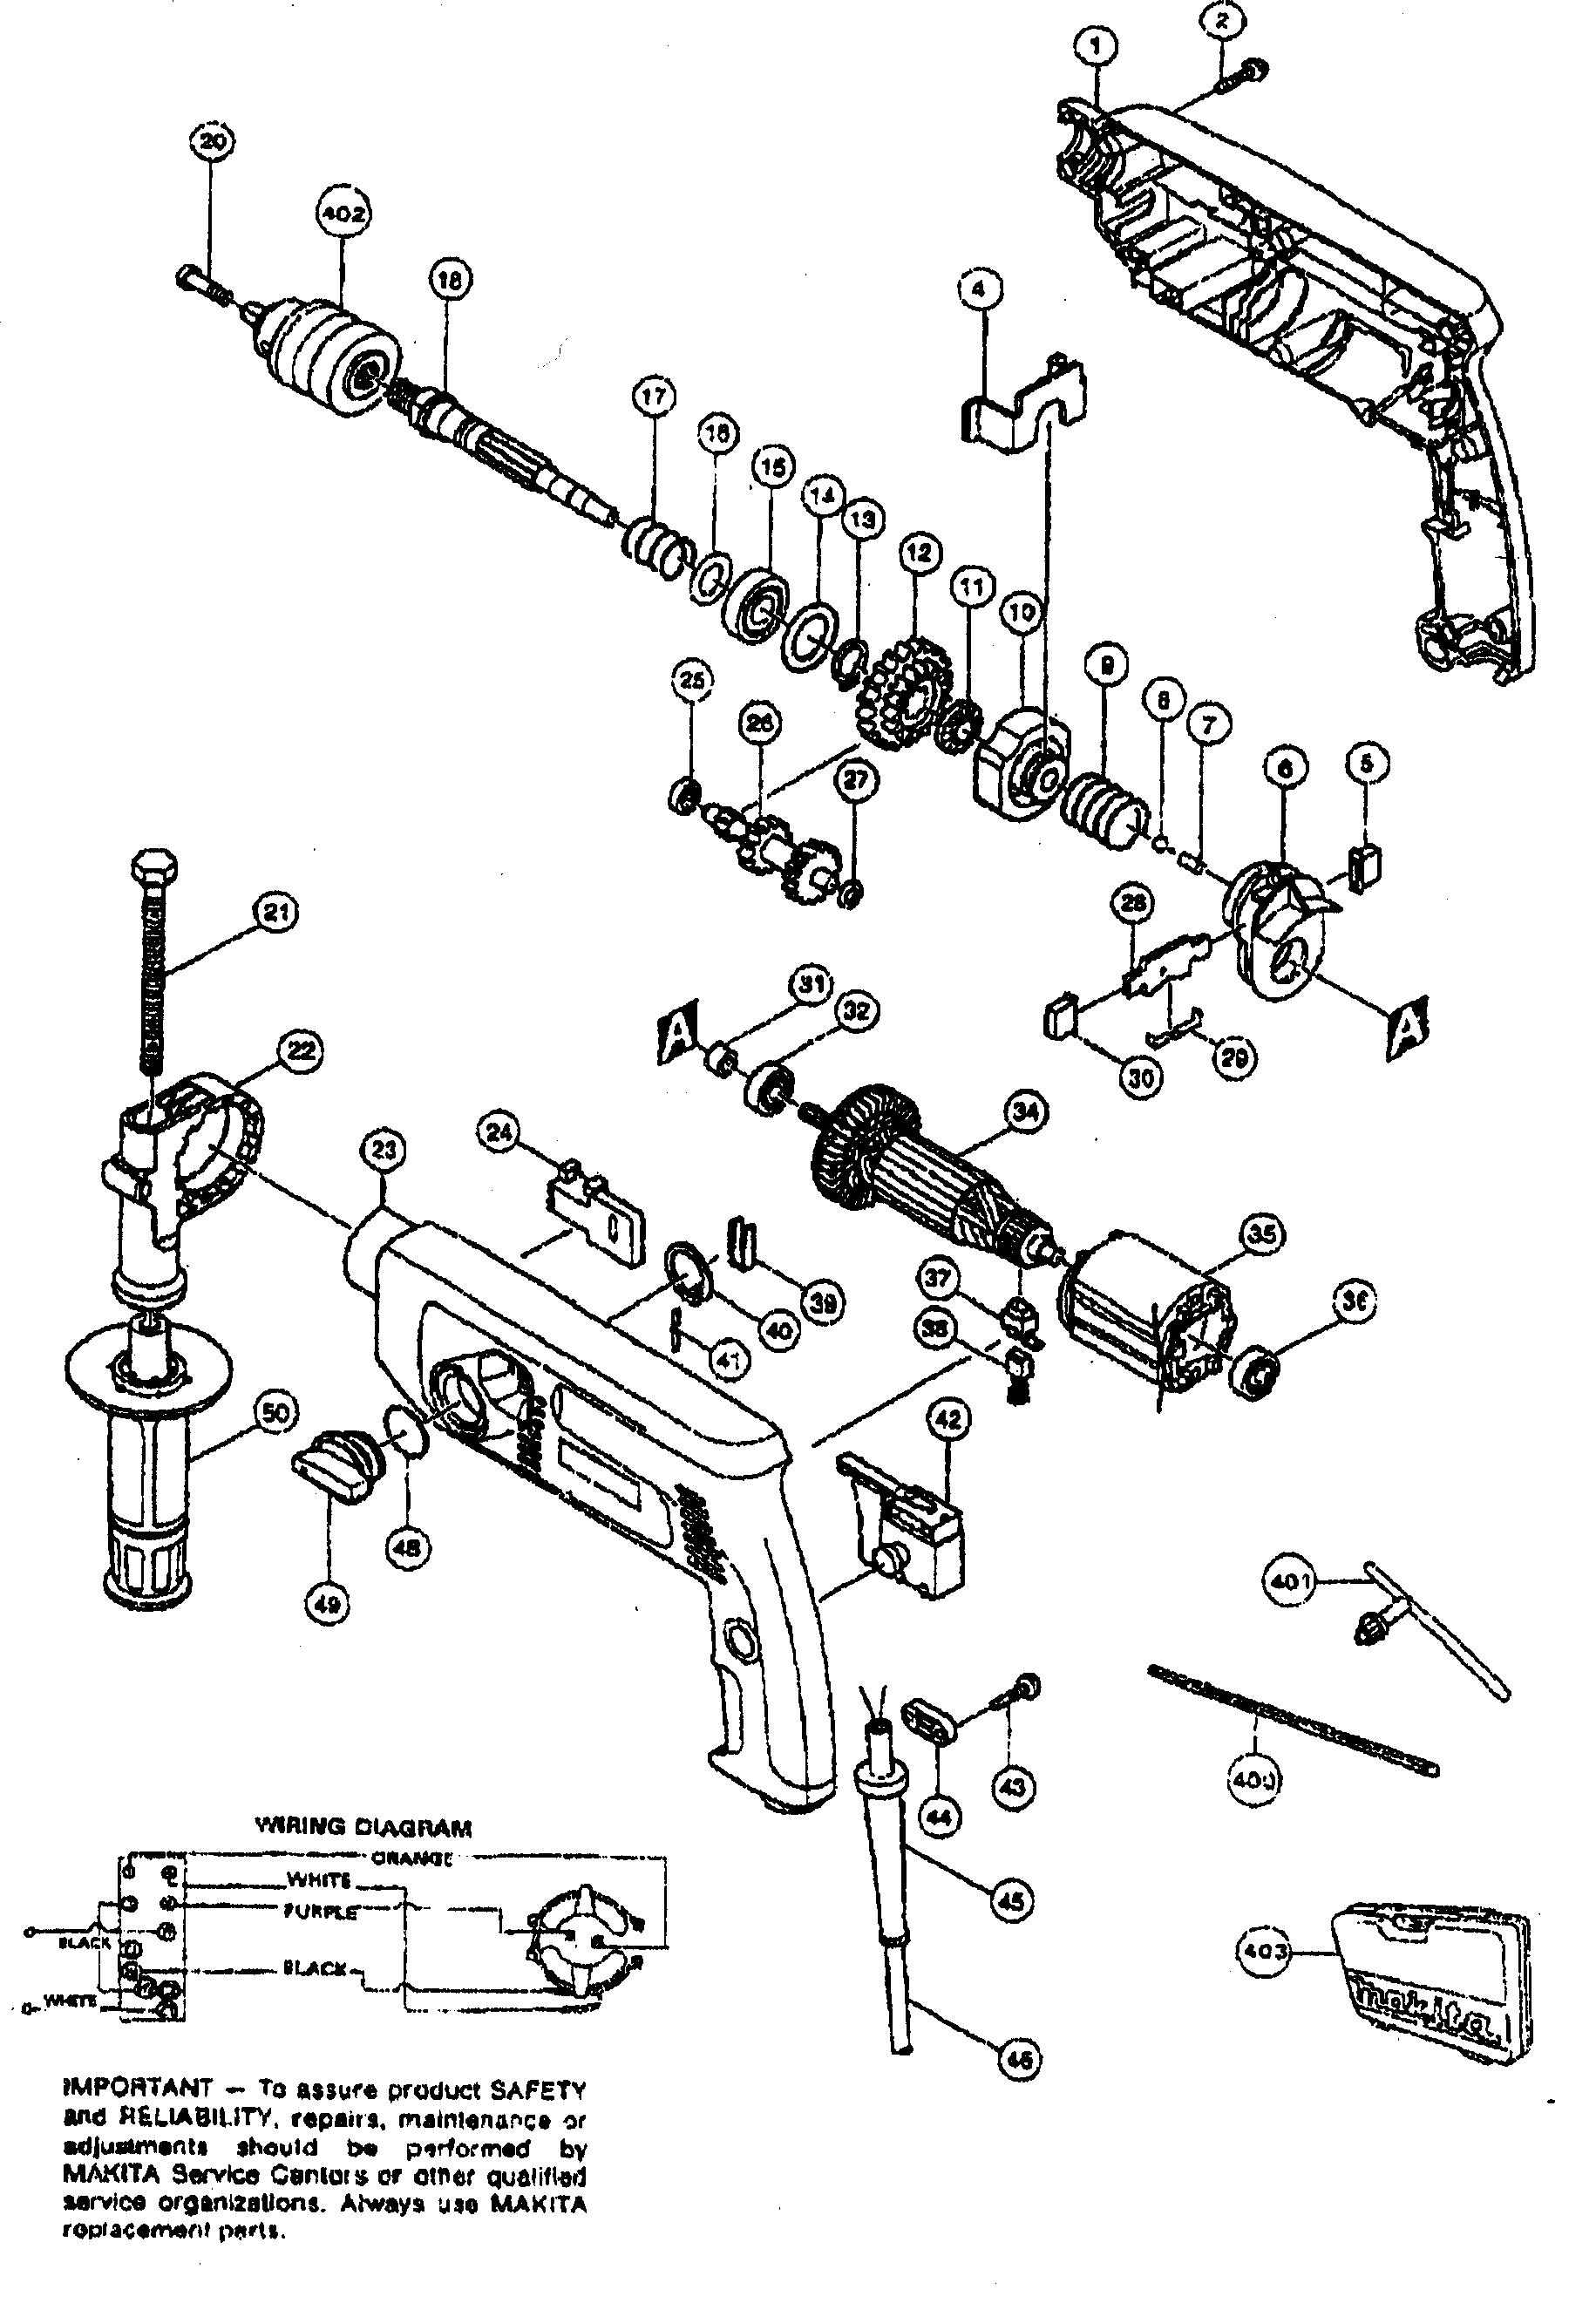 Makita model HP2040 drill hammer genuine parts